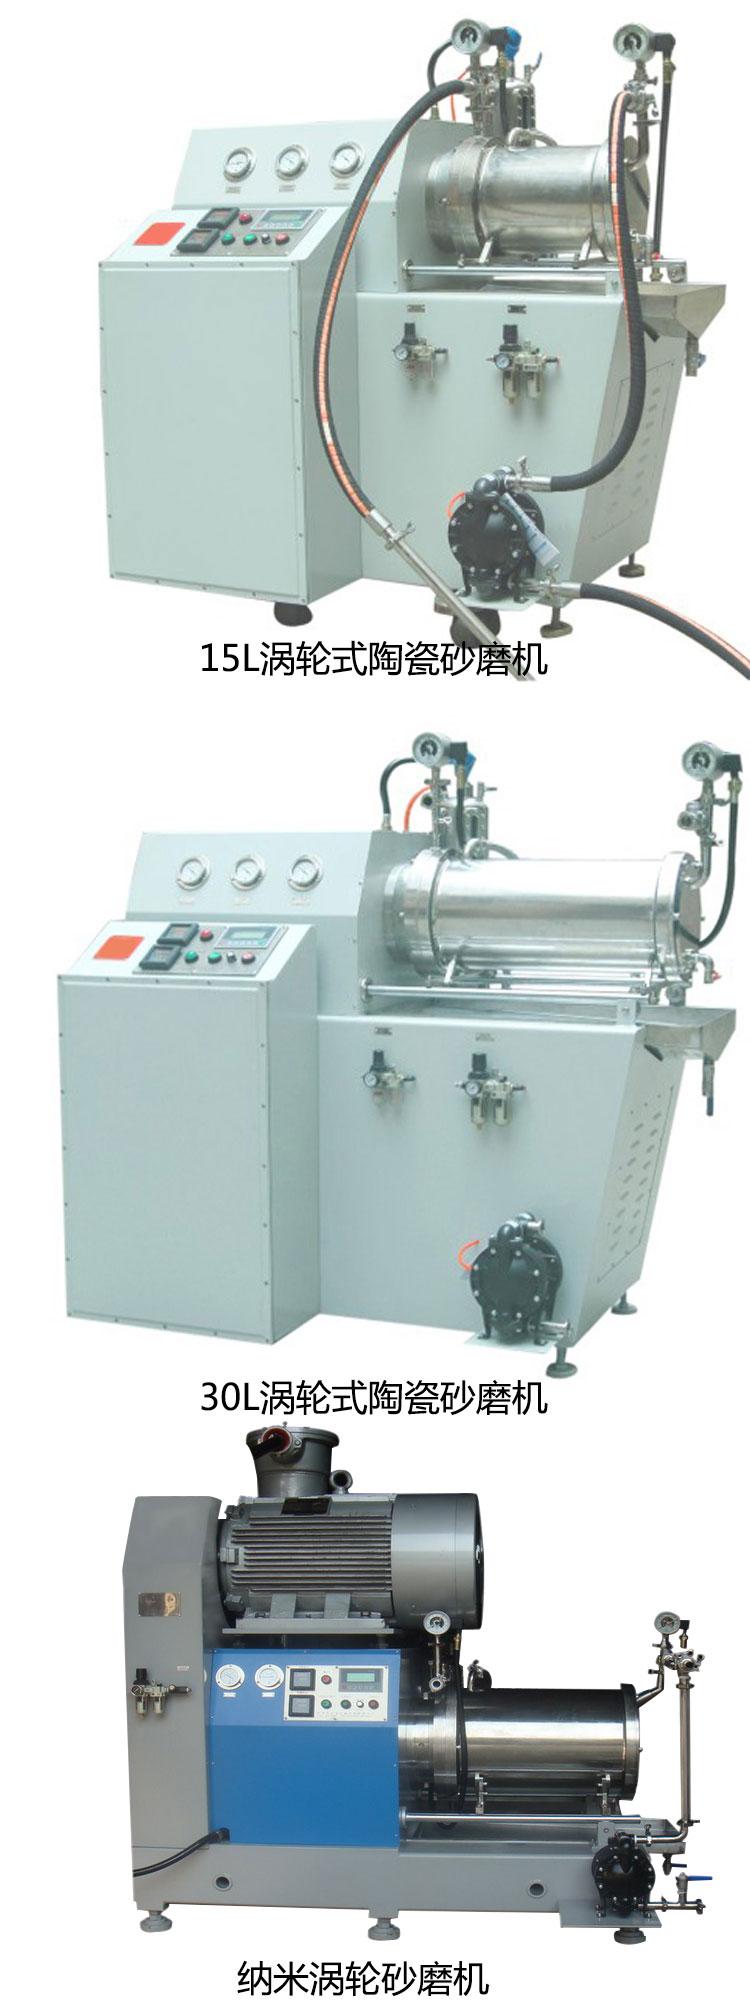 MITR米淇15L涡轮式陶瓷千赢平台官网产品展示